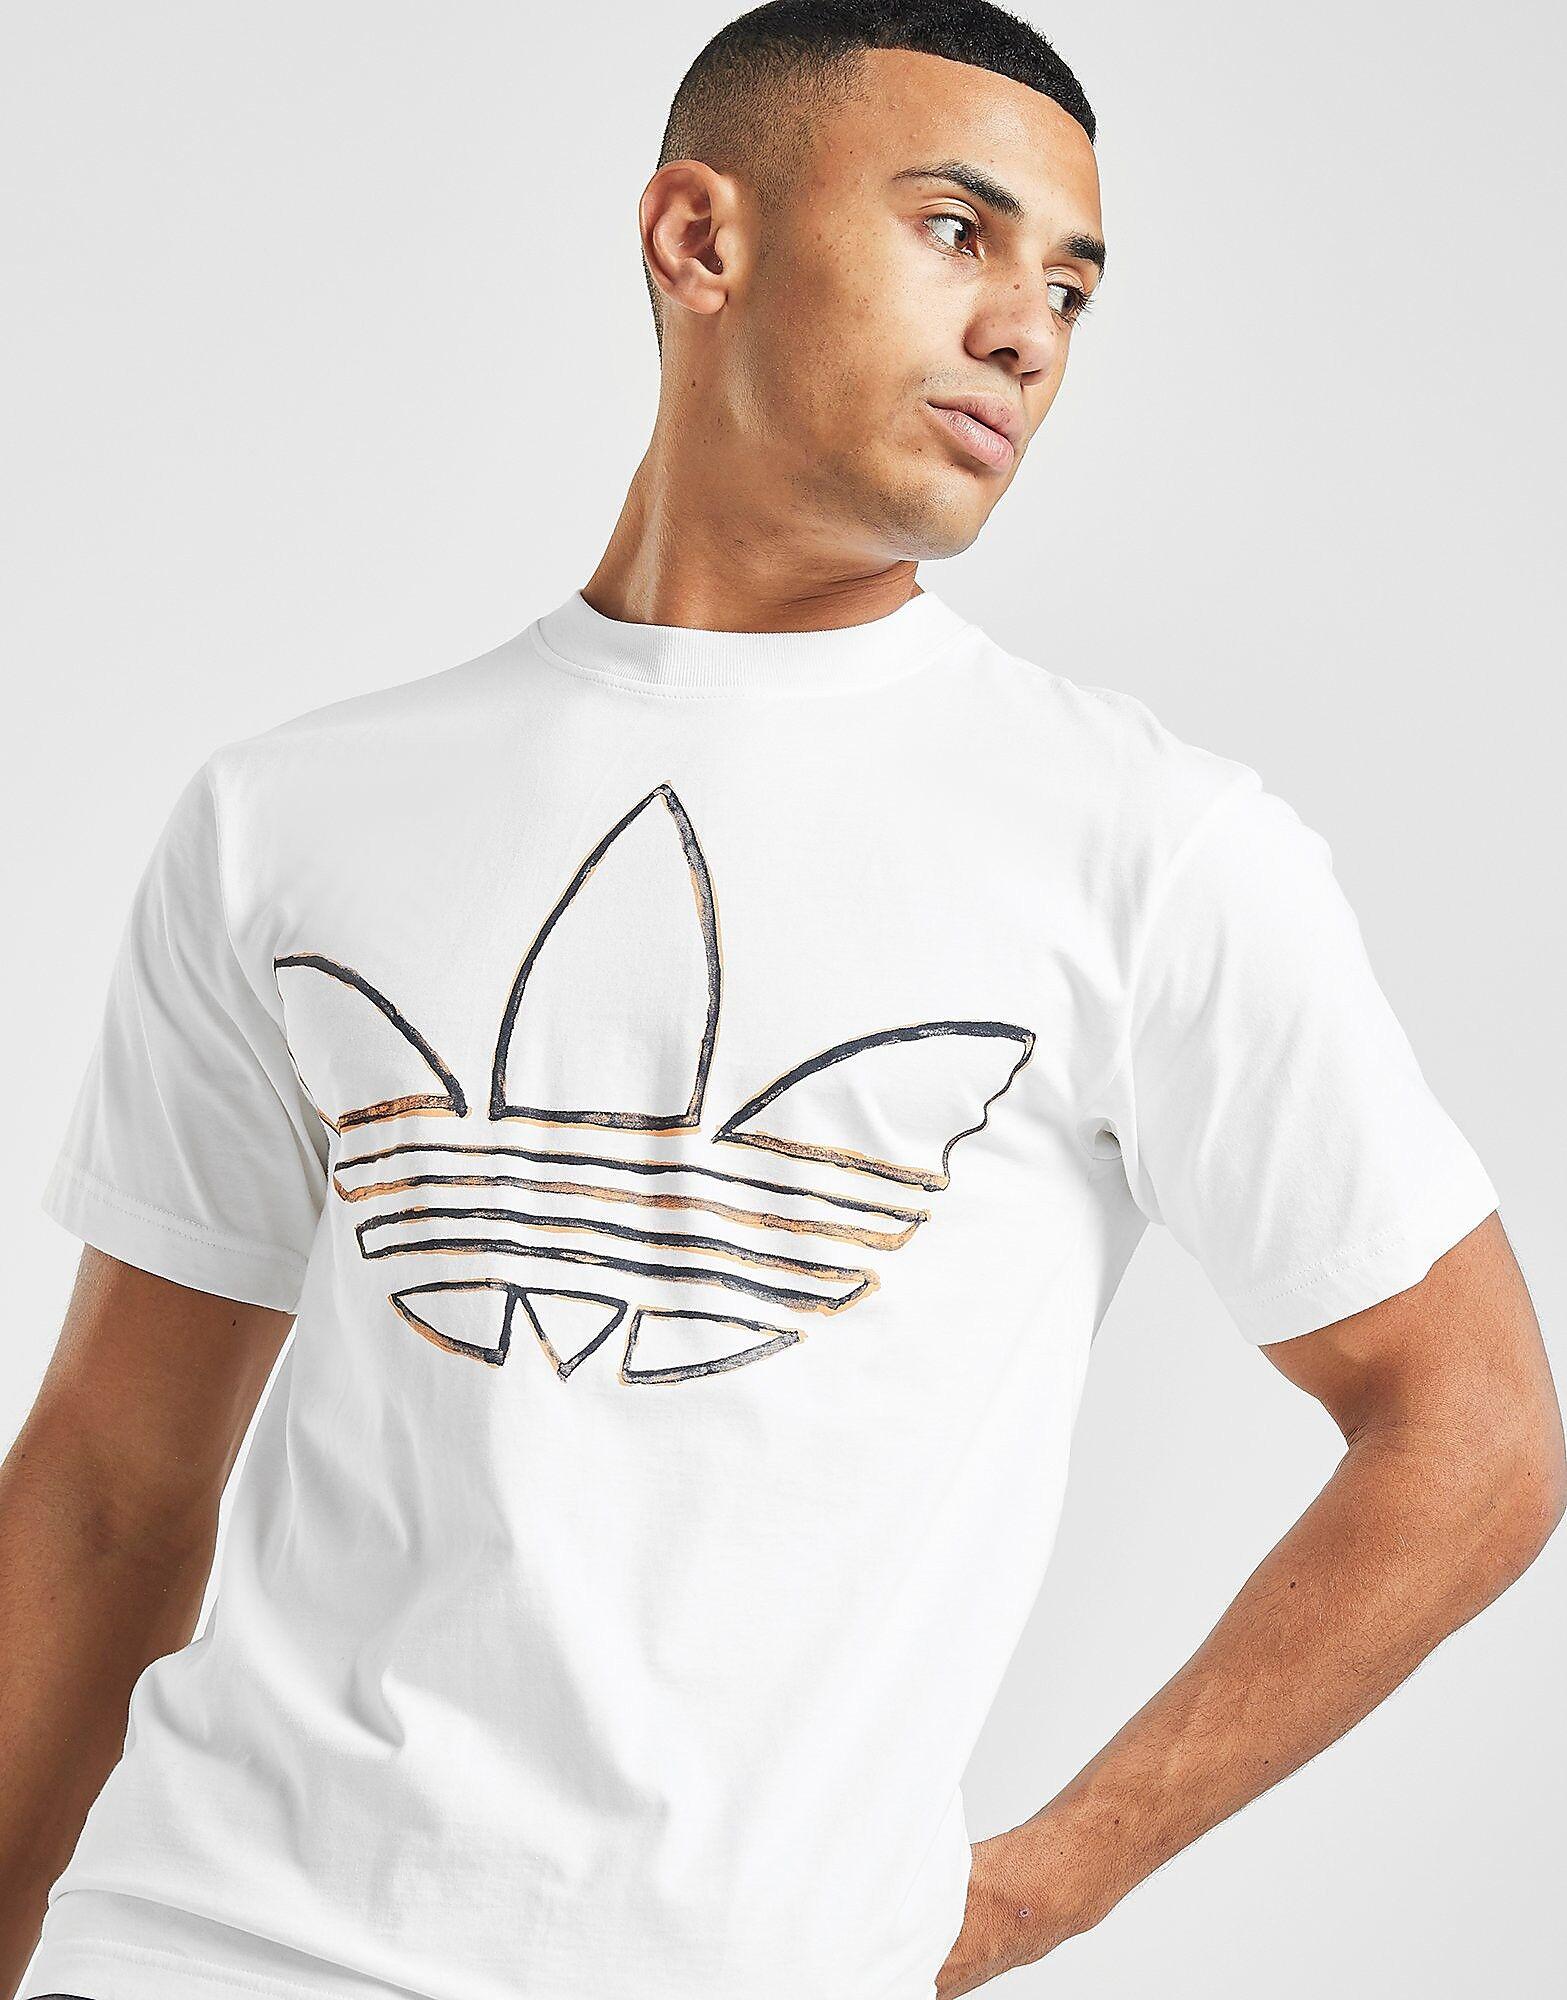 Image of Adidas Originals Watercolour T-paita Miehet - Mens, Valkoinen